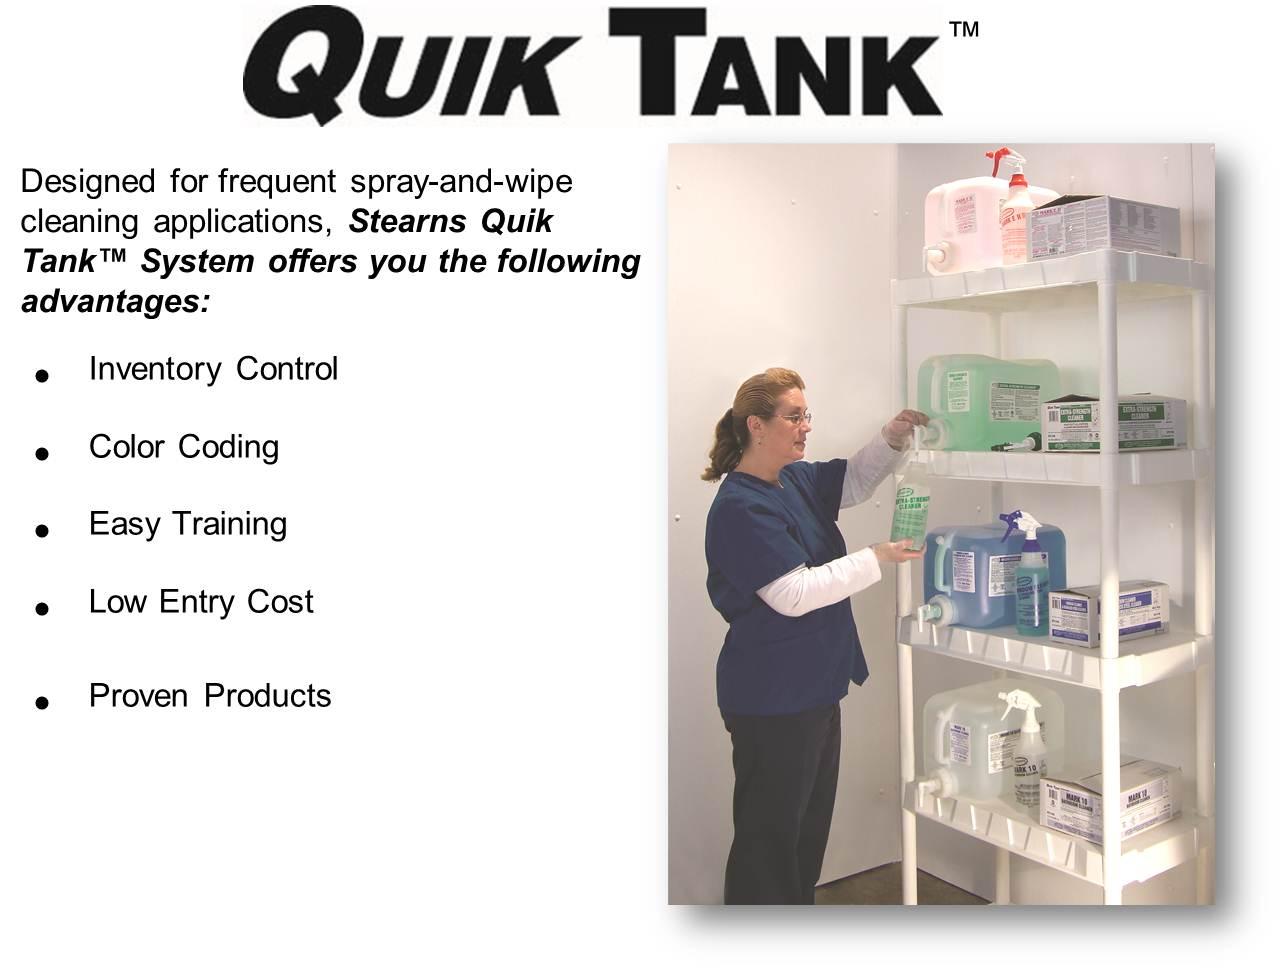 quick-tank-pic1.jpg